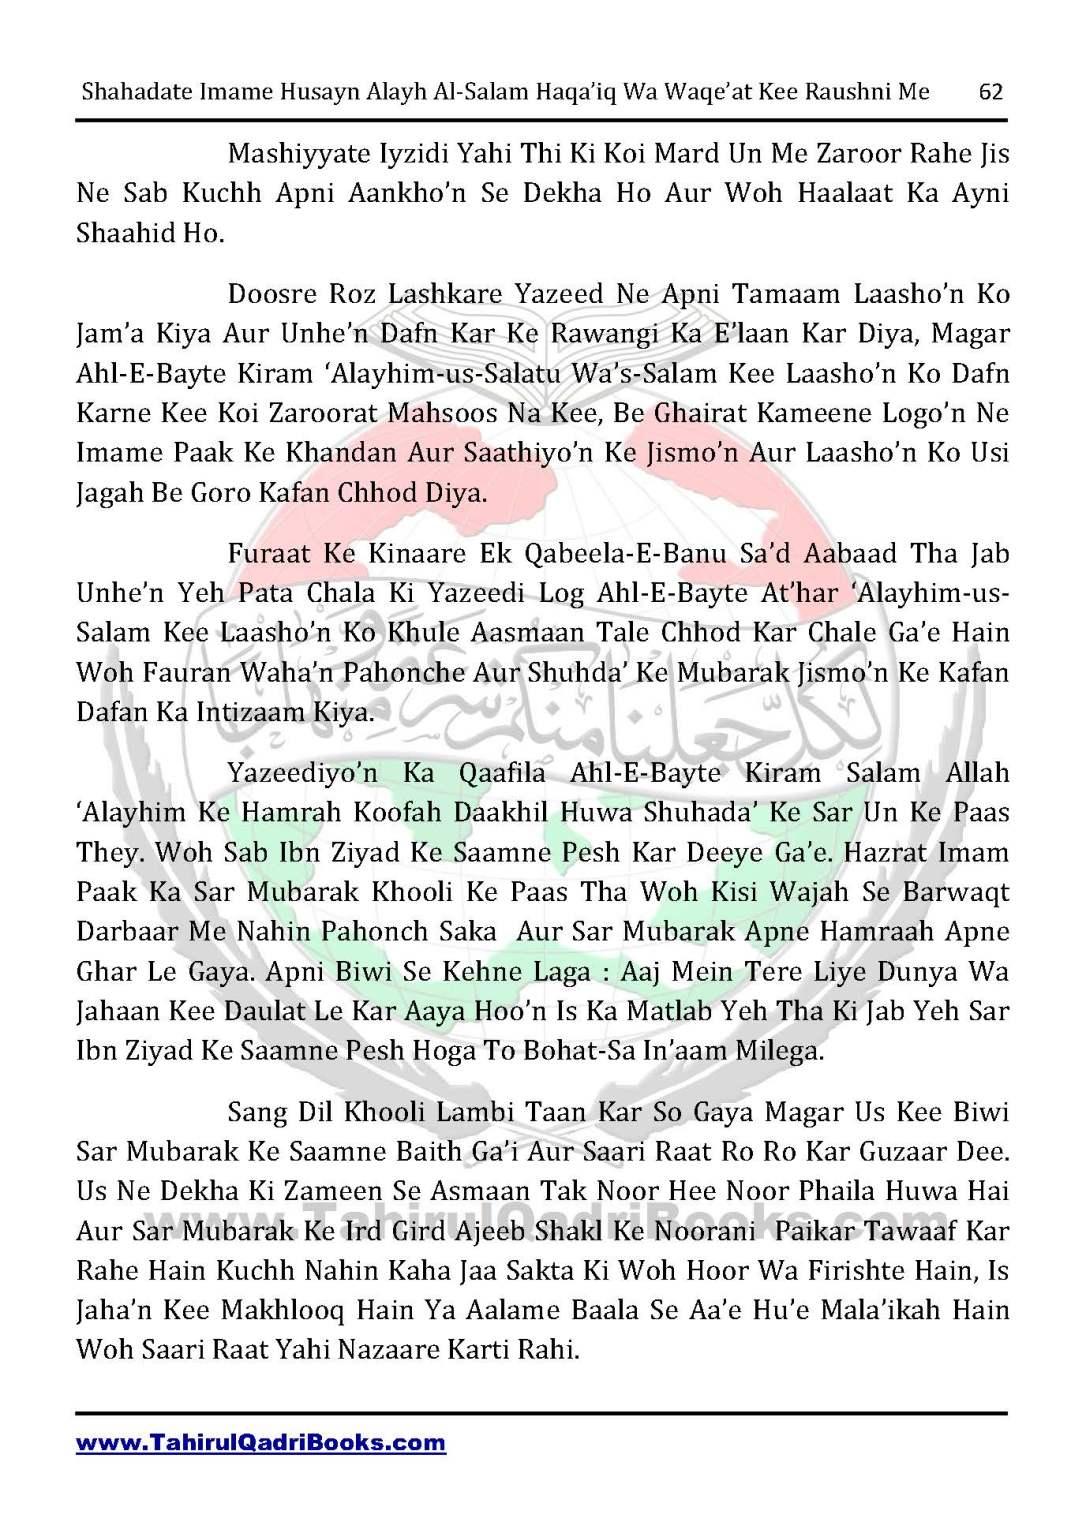 shahadate-imame-husayn-alayh-is-salam-haqaiq-wa-waqe_at-kee-raushni-me-in-roman-urdu-unlocked_Page_62